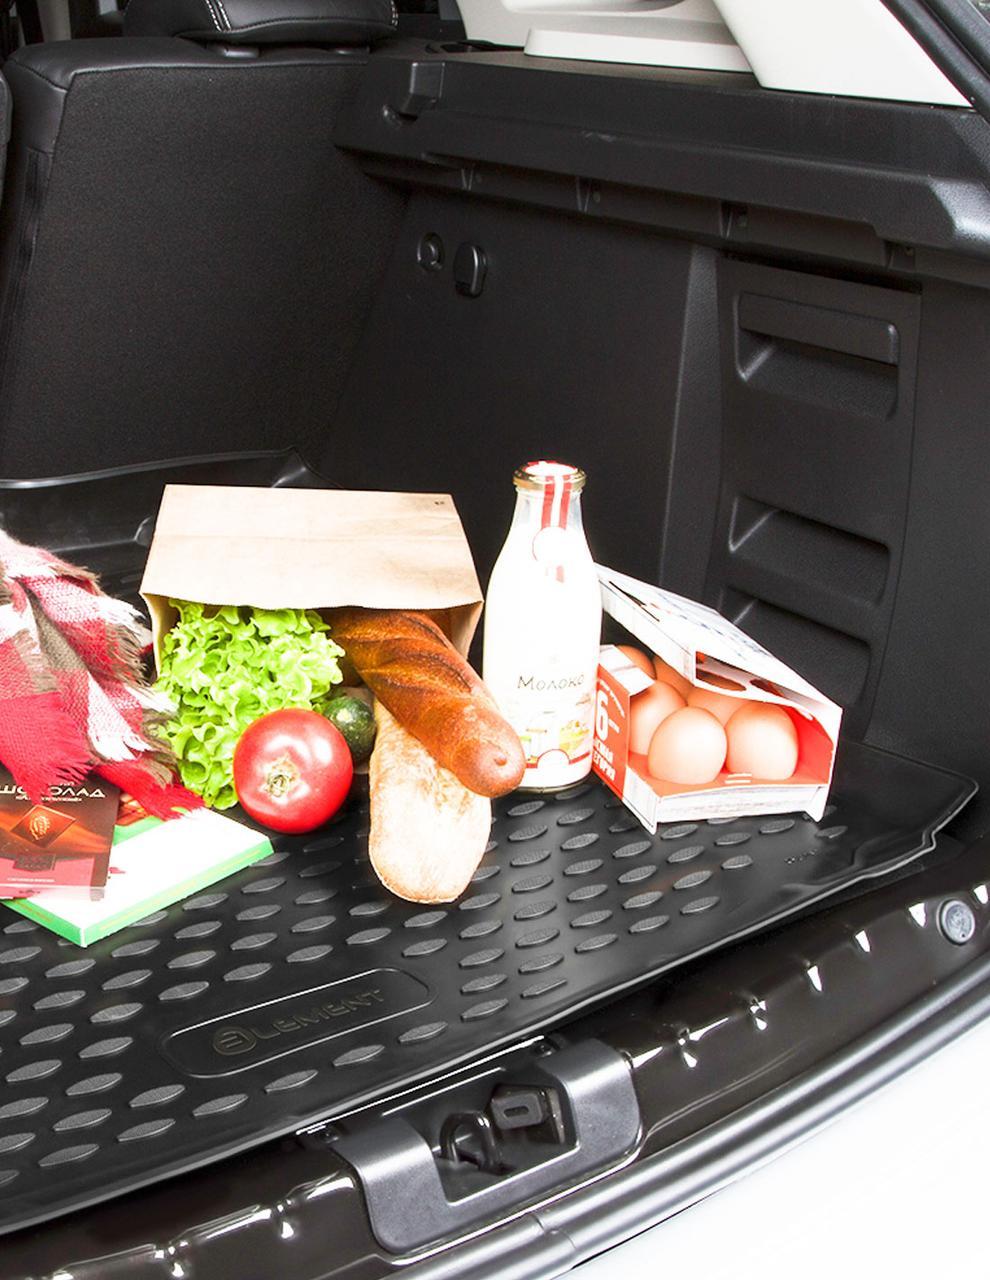 Коврик в багажник Nissan Murano, 2016->, 1 шт. (полиуретан)  ELEMENT3661B13